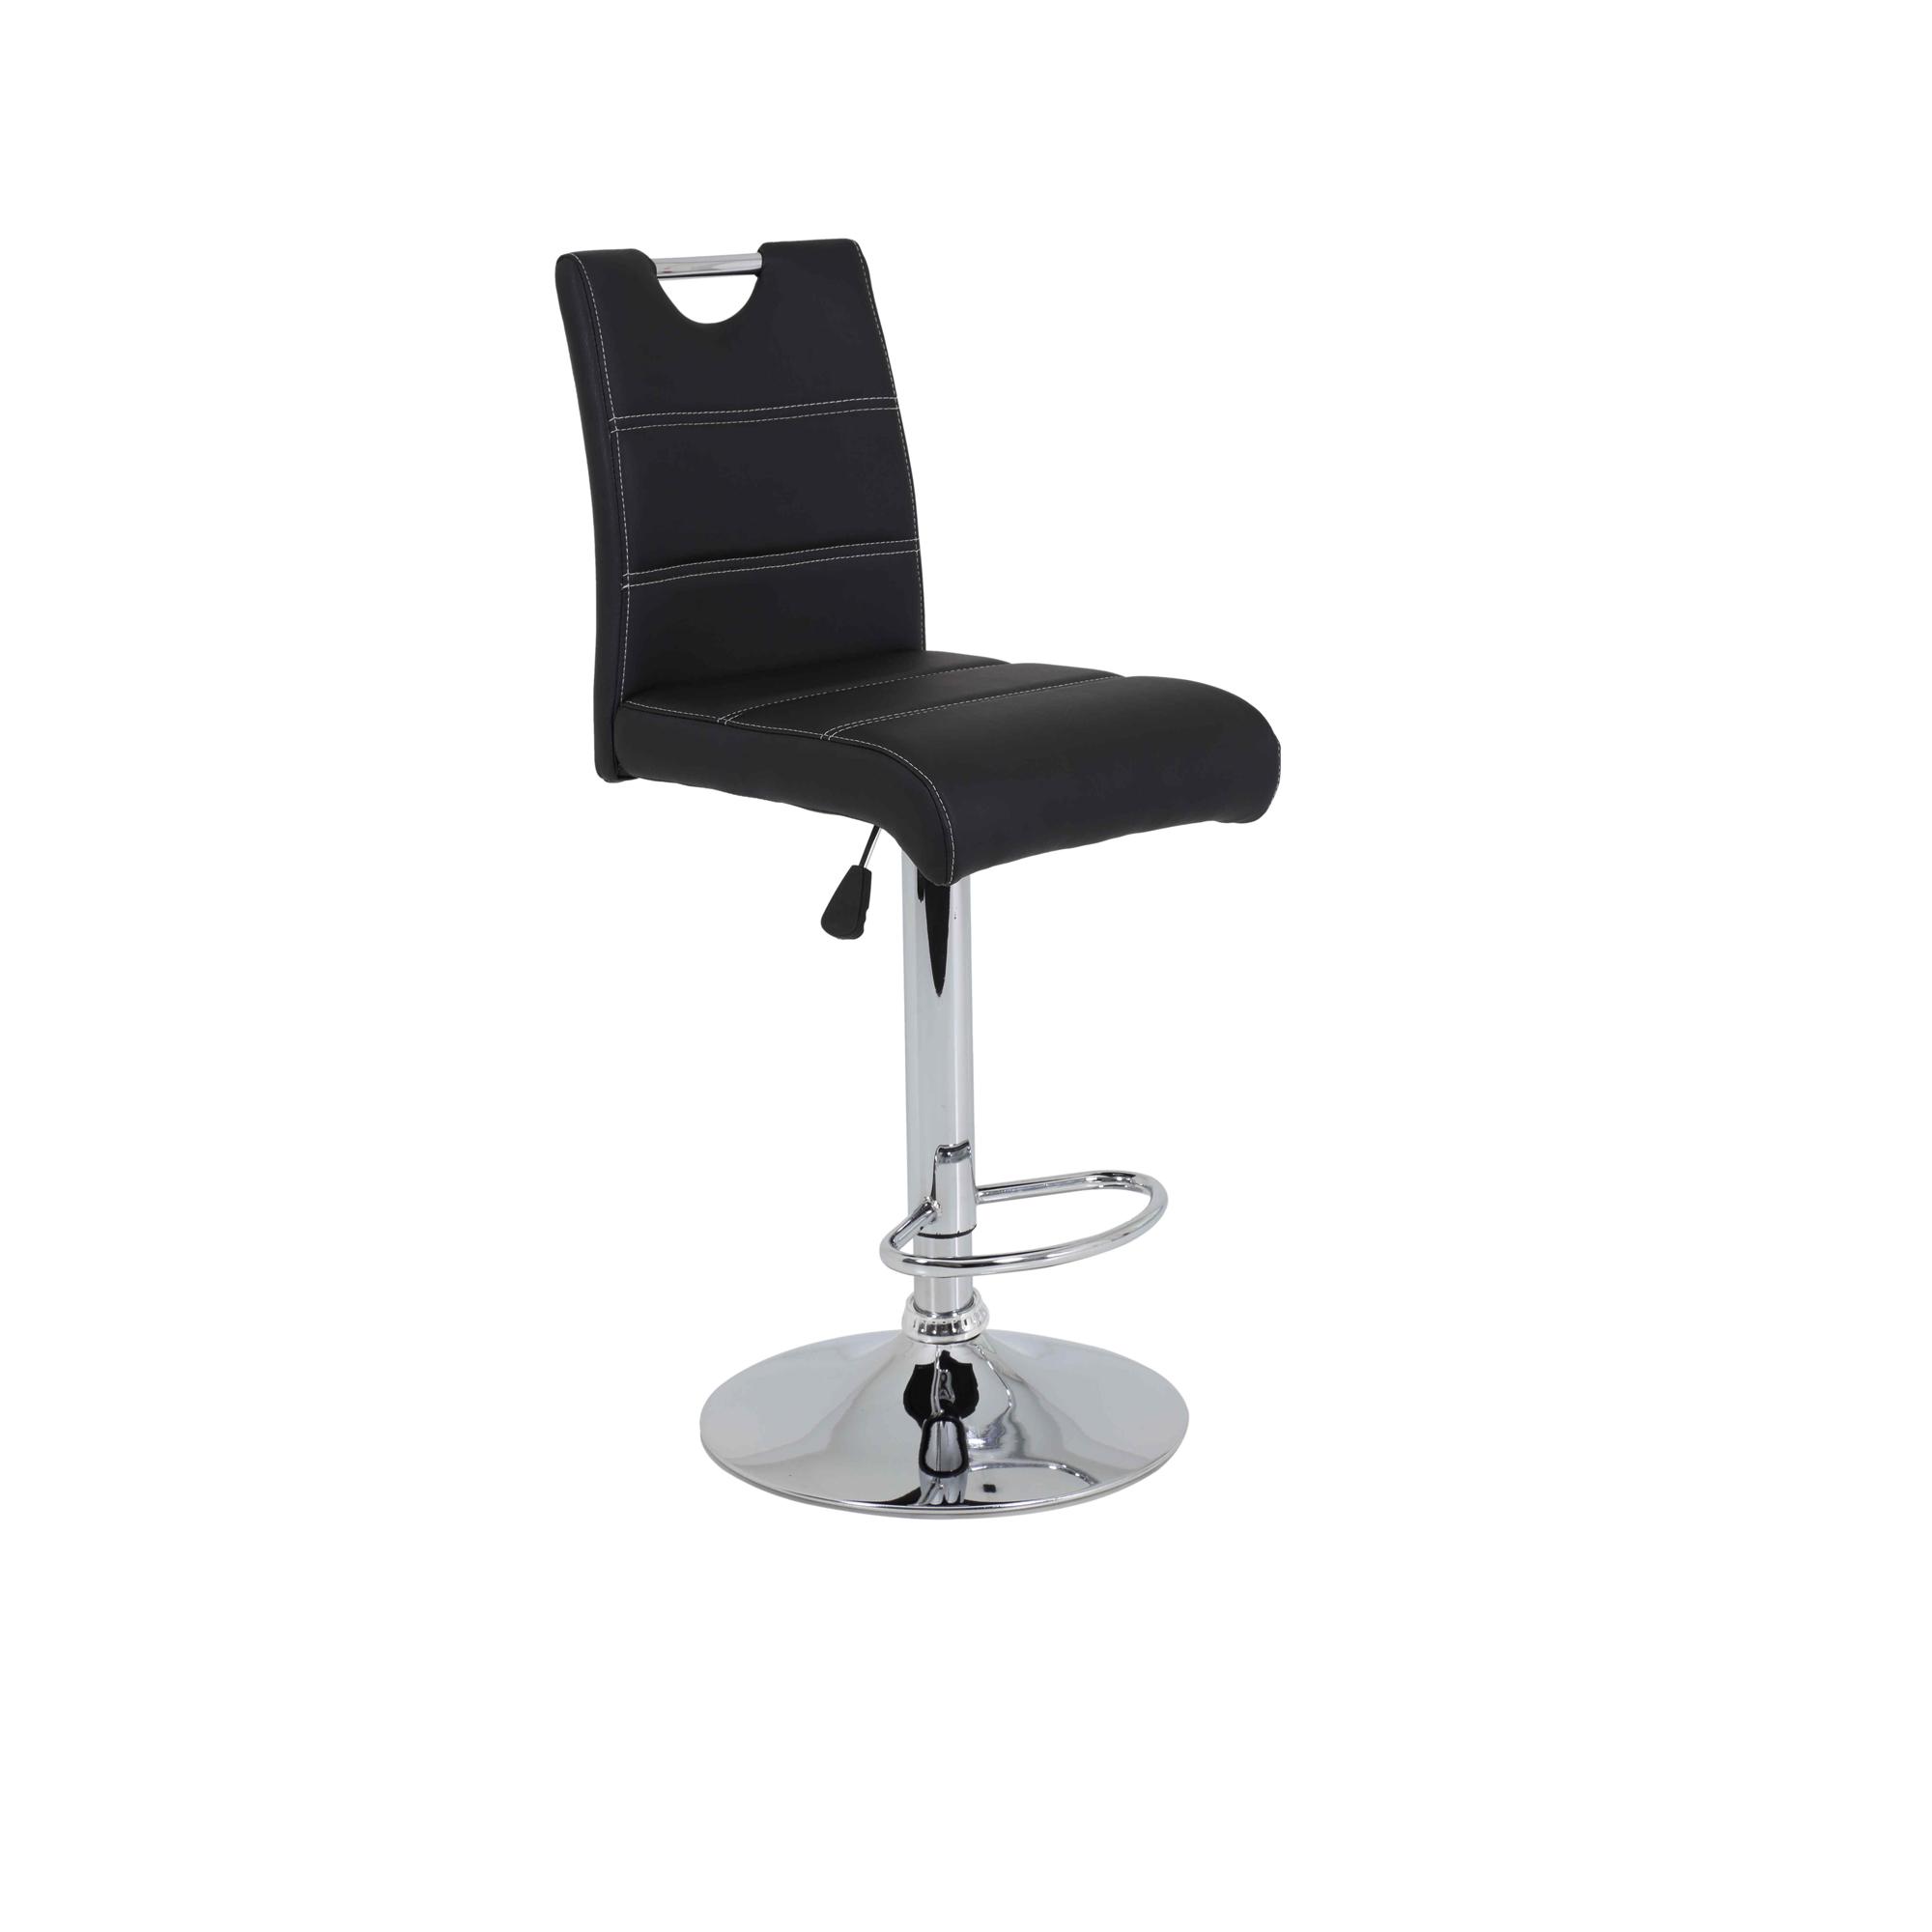 barhocker miranda 2er set h henverstellbar kunstleder 38 cm breit schwarz wohnen st hle. Black Bedroom Furniture Sets. Home Design Ideas